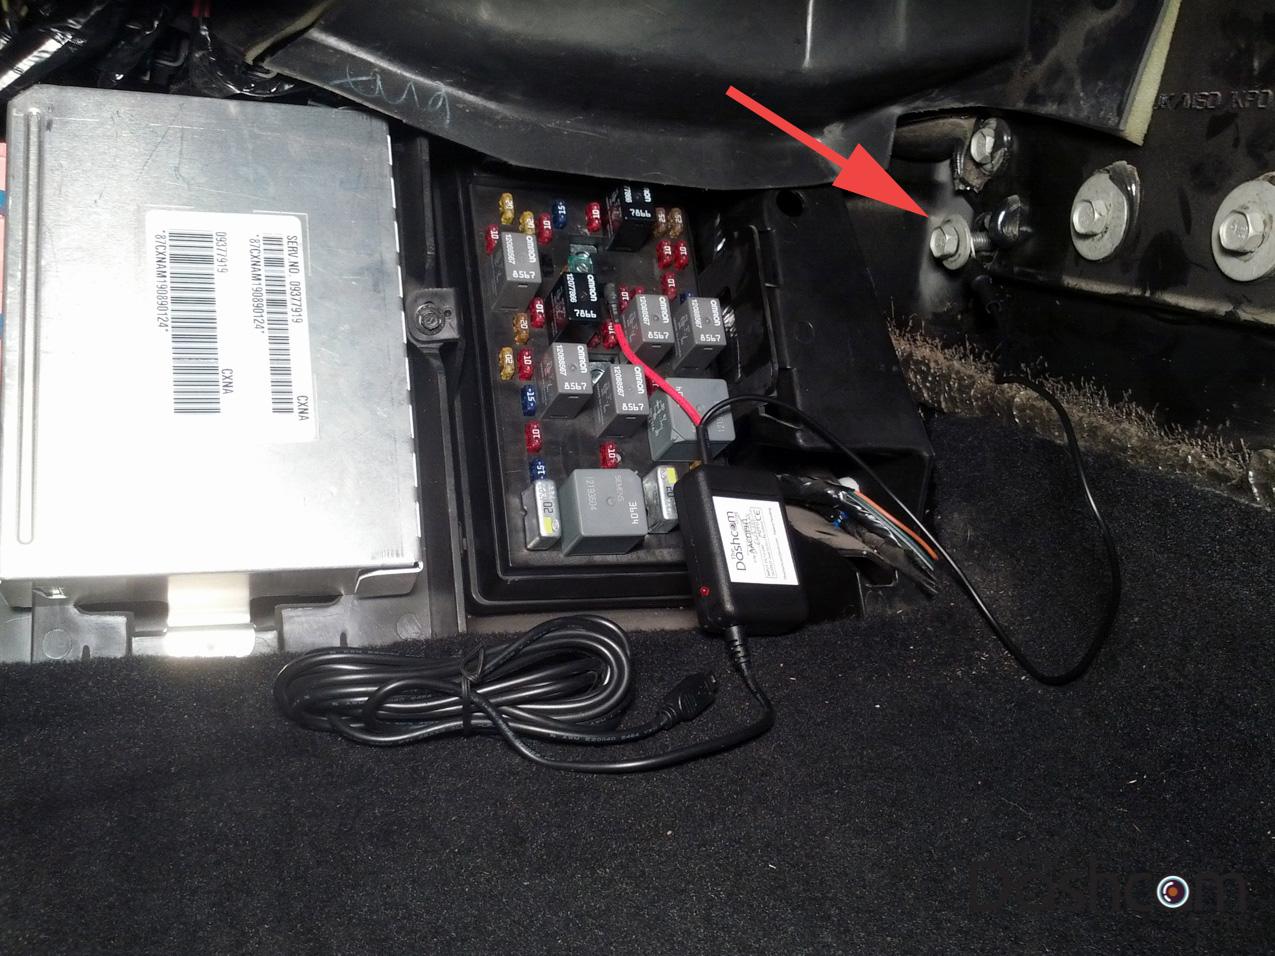 1999 Corvette Fuse Box Wiring Diagram Schematics C6 Dvr M880gs Dash Cam And Installation Kit Hardwired In Chevy C5